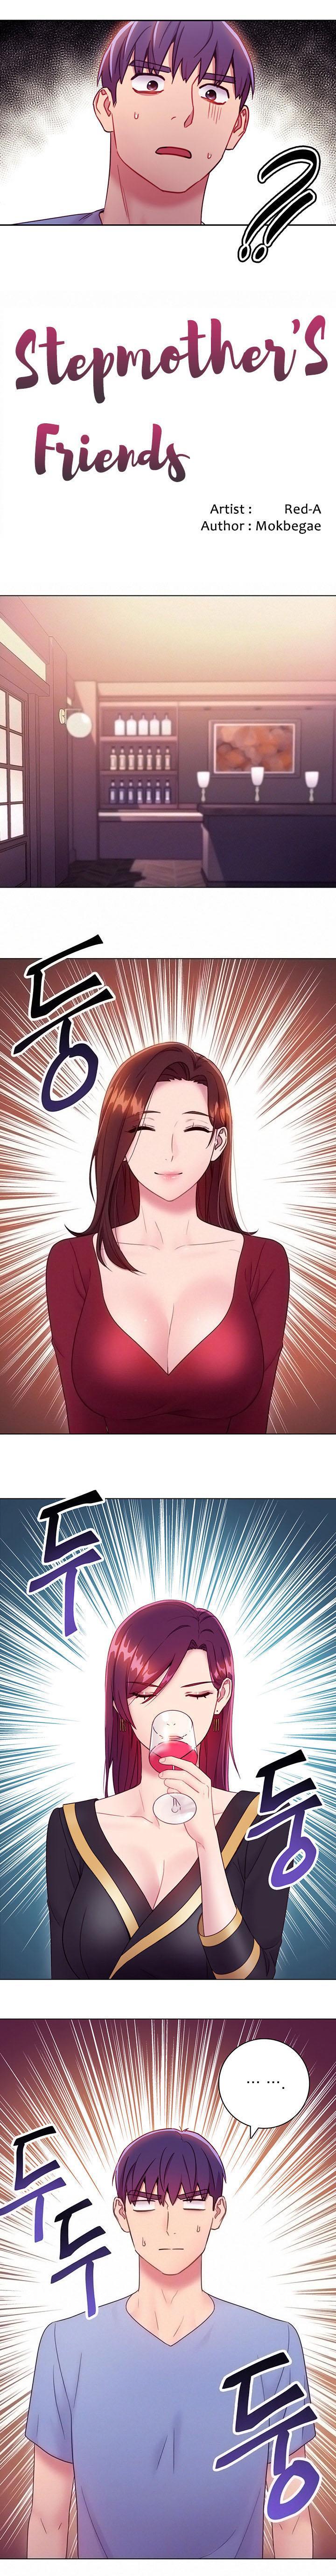 [Neck Pilllow] Stepmother Friends Ch.40/? [English] [Hentai Universe] NEW! 22/10/2020 327